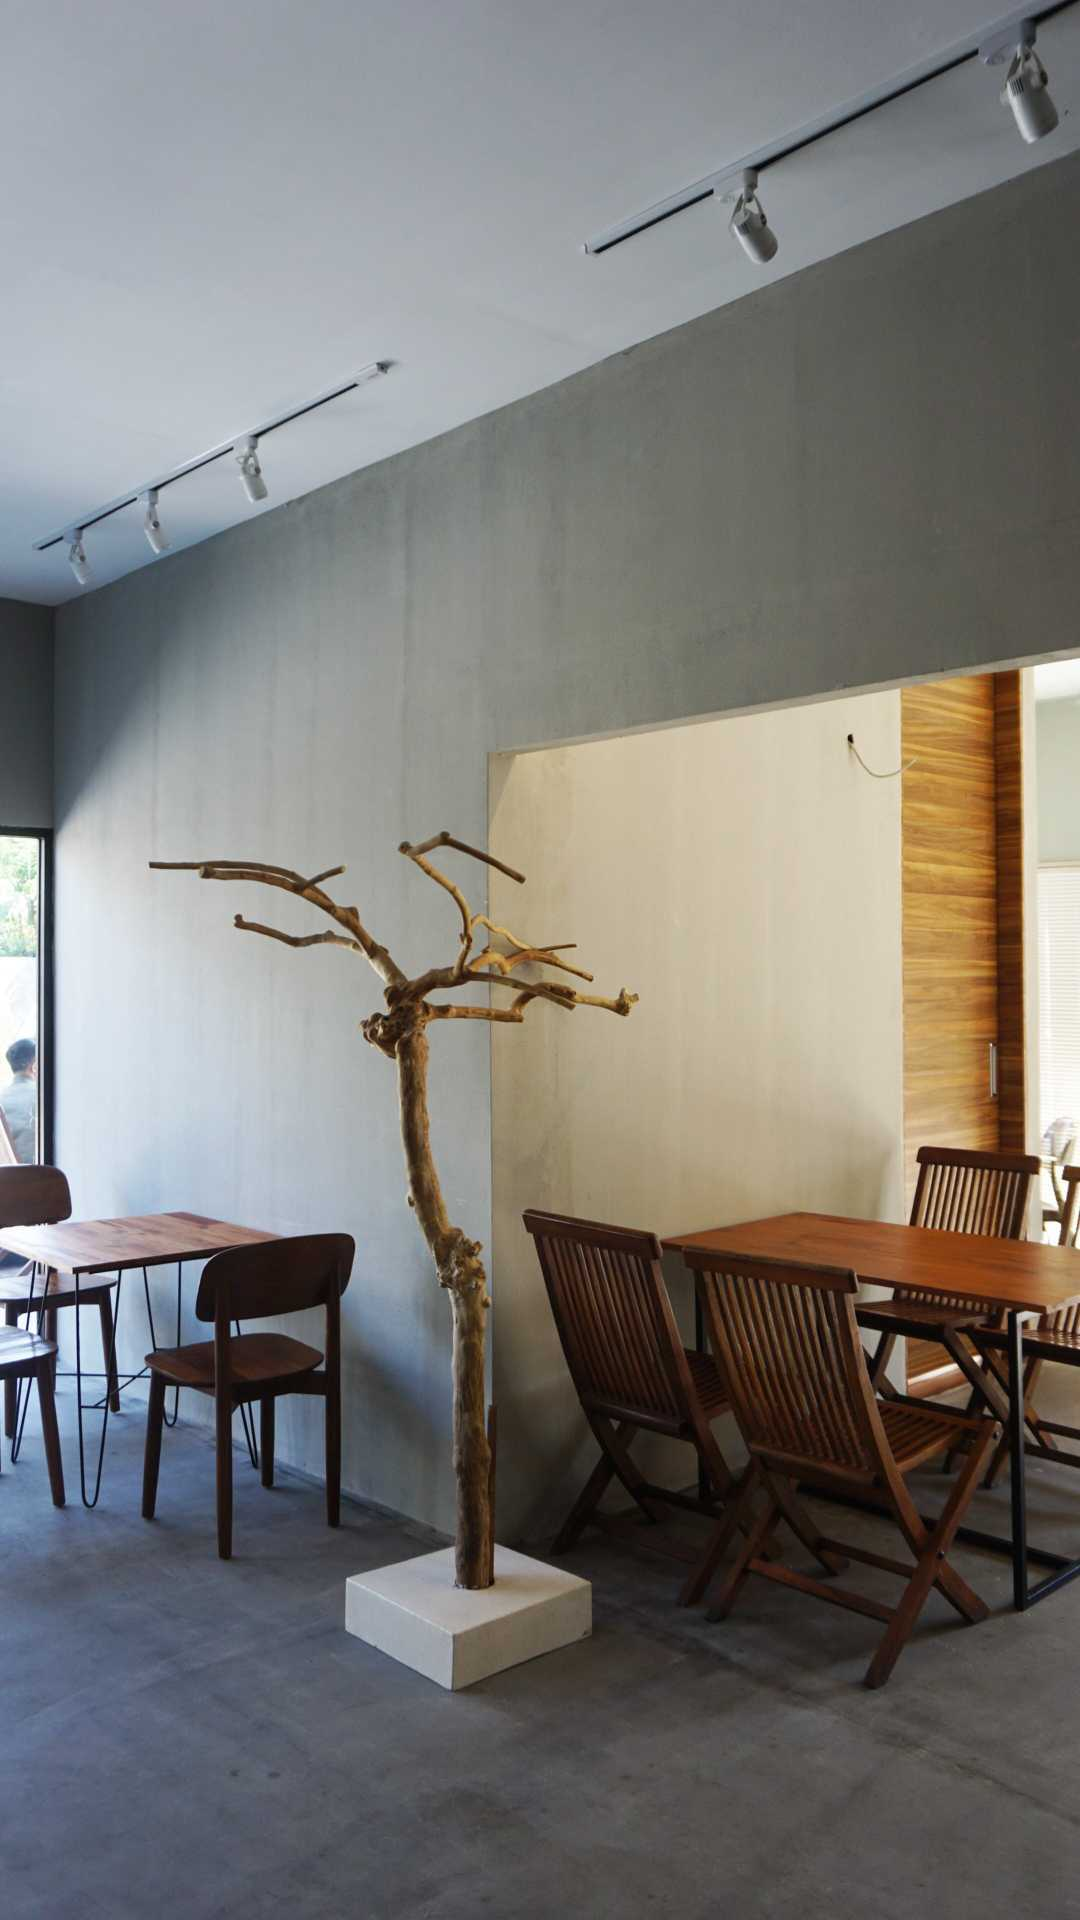 Sekala Darbe Cafe & Office, Surabaya Surabaya, Kota Sby, Jawa Timur, Indonesia Surabaya, Kota Sby, Jawa Timur, Indonesia Sekala-Drabe-Cafe-Office  97785